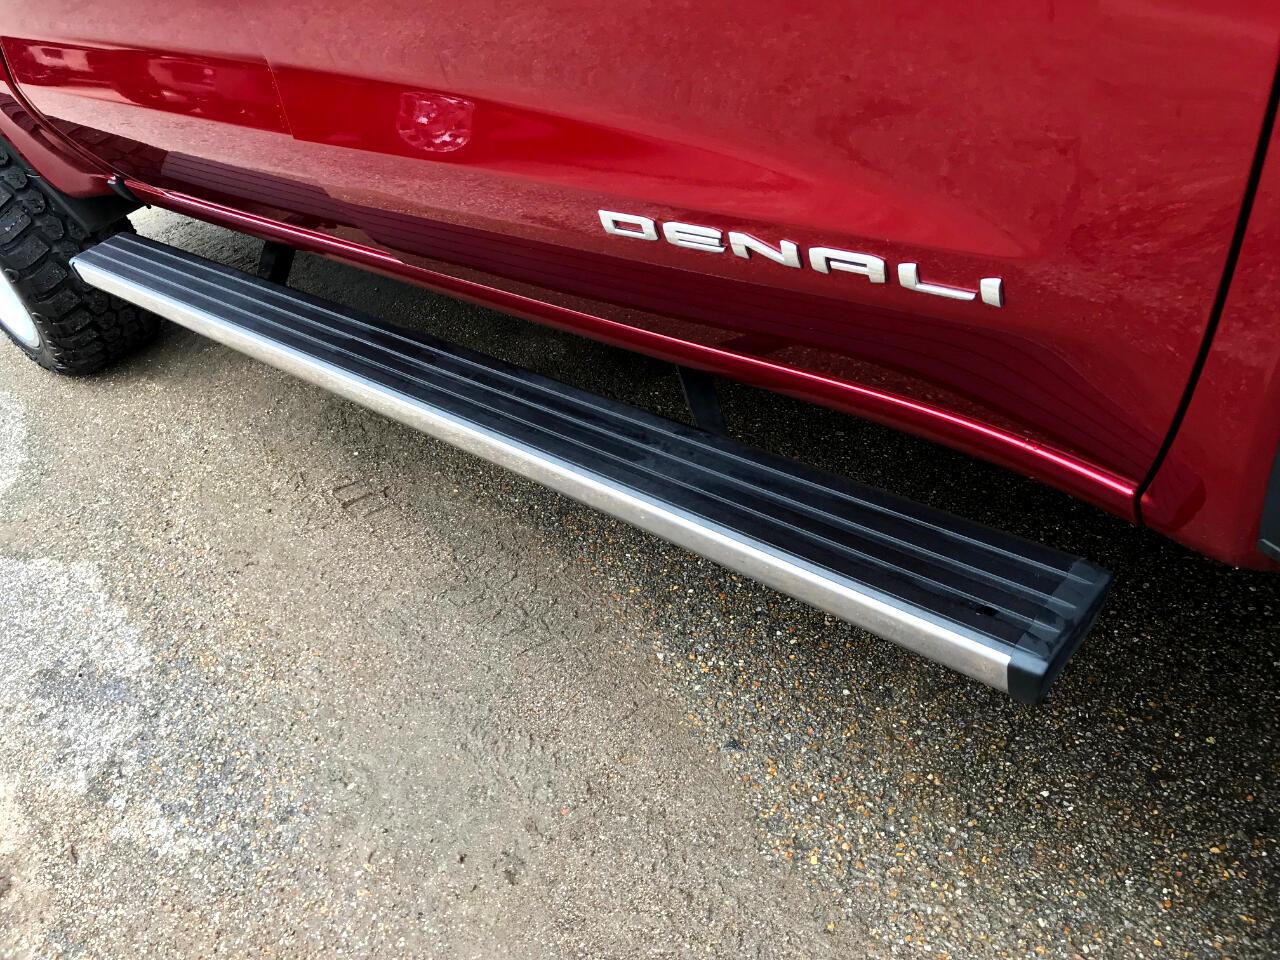 2019 GMC Sierra 1500 DENALI CREW CAB SHORT BED 4WD CUSTOM LIFTED